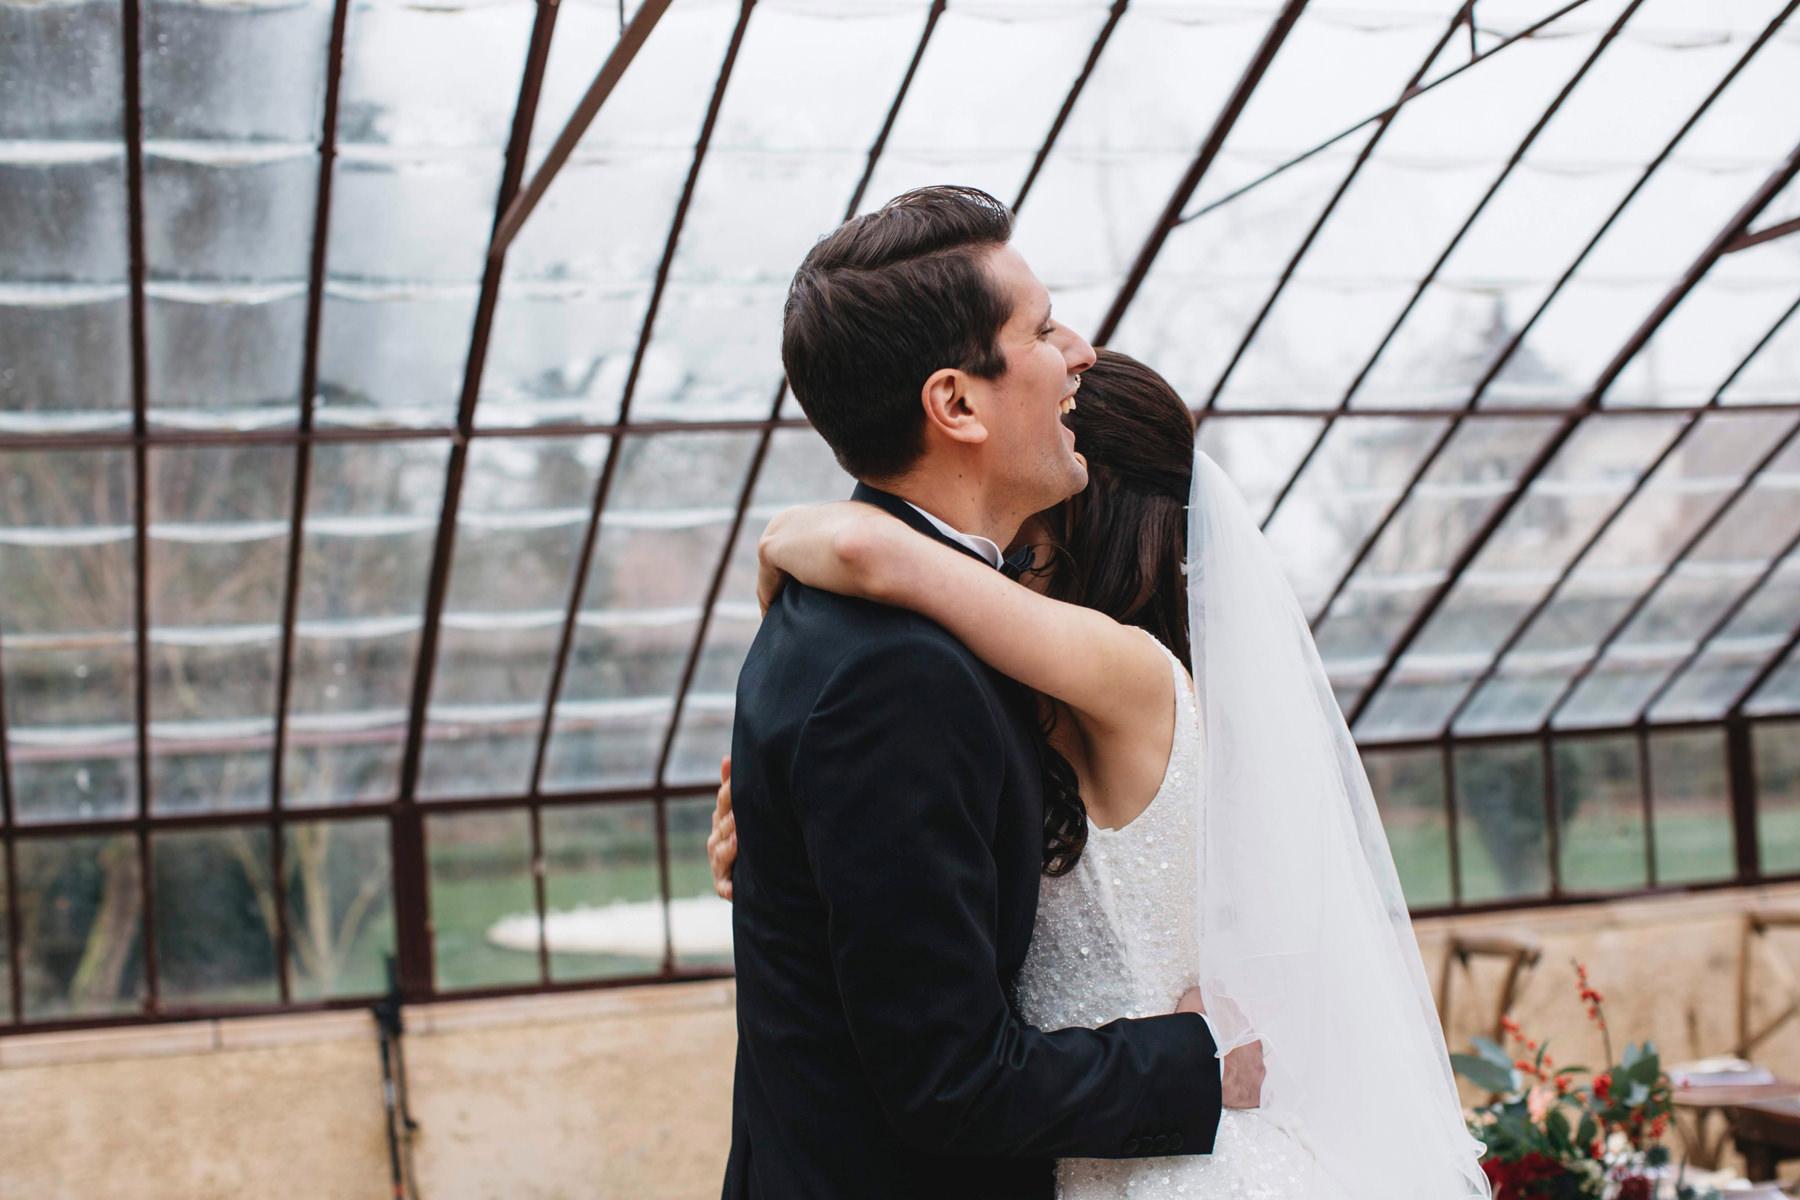 mariage-daphne-moreau-vincent-verderonne-celine-marks036